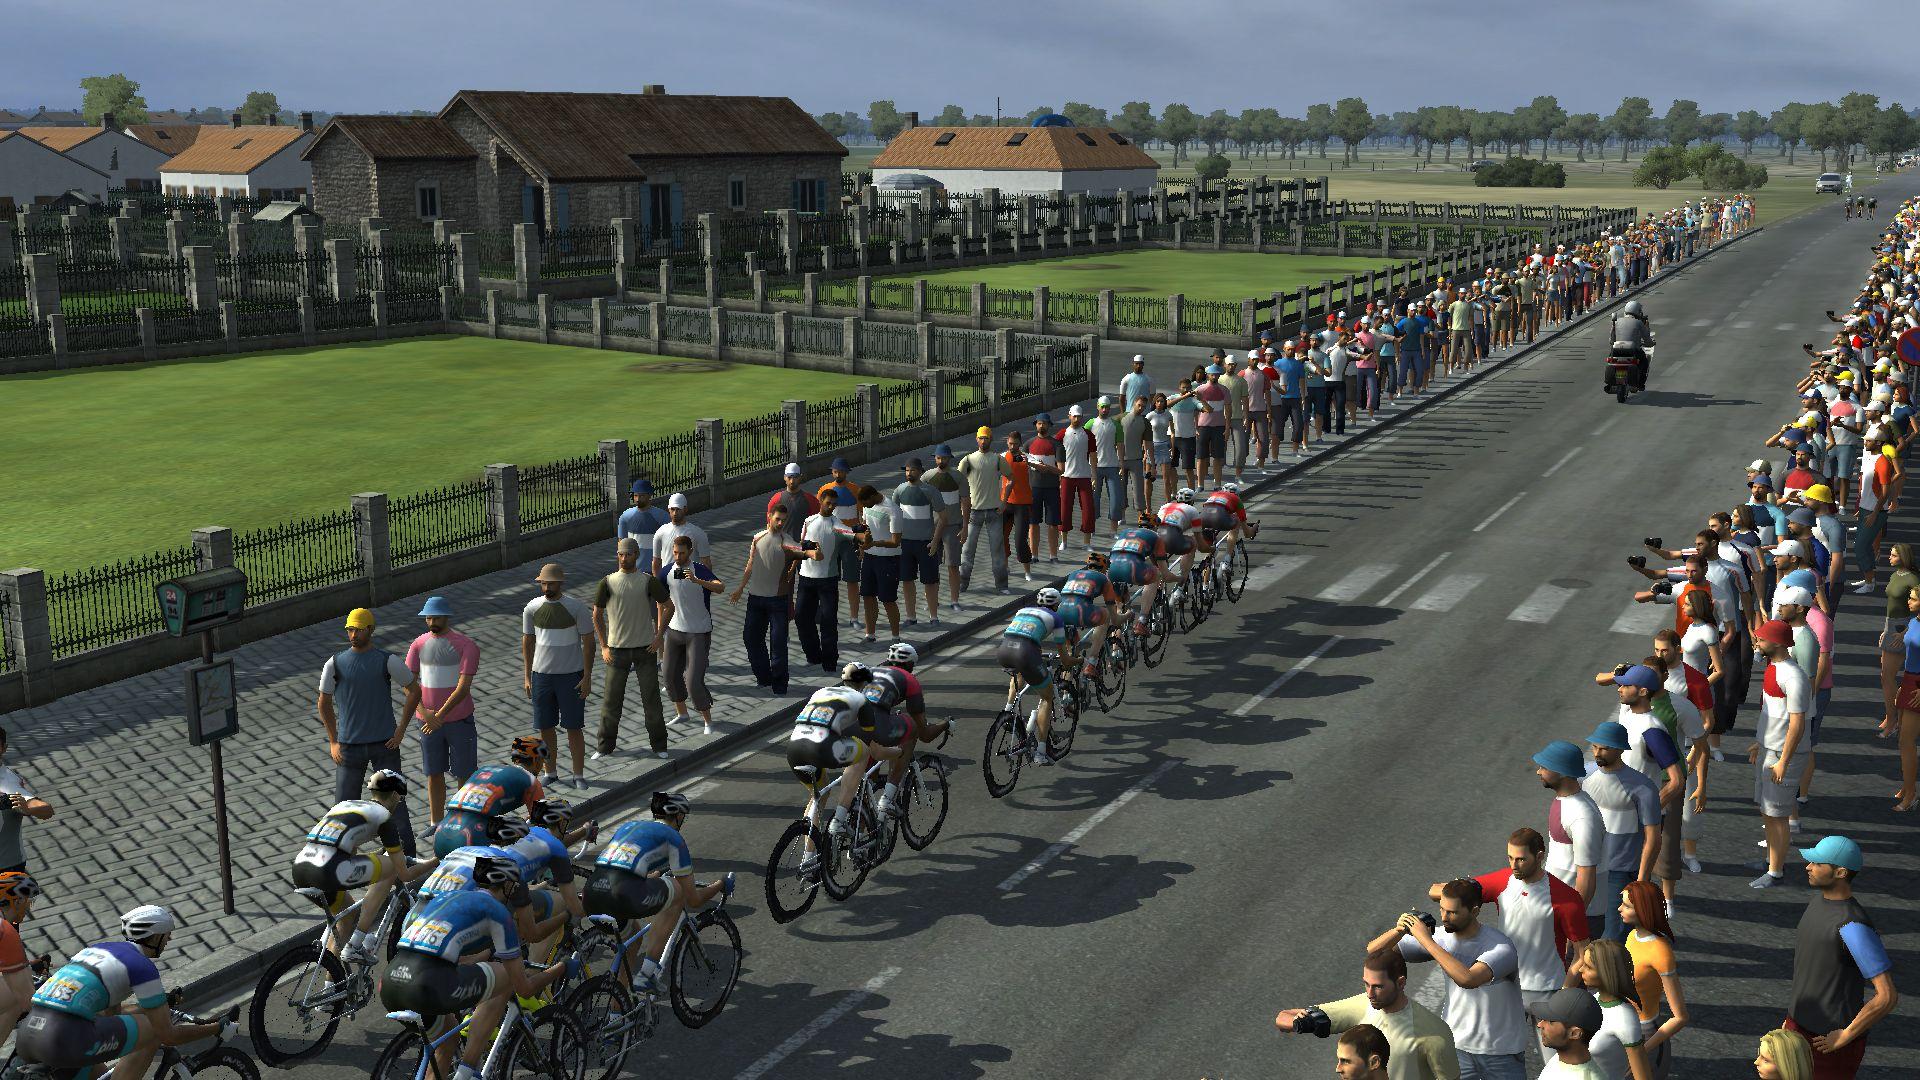 pcmdaily.com/images/mg/2018/Races/GTM/Giro/mg18_giro_07_PCM0081.jpg